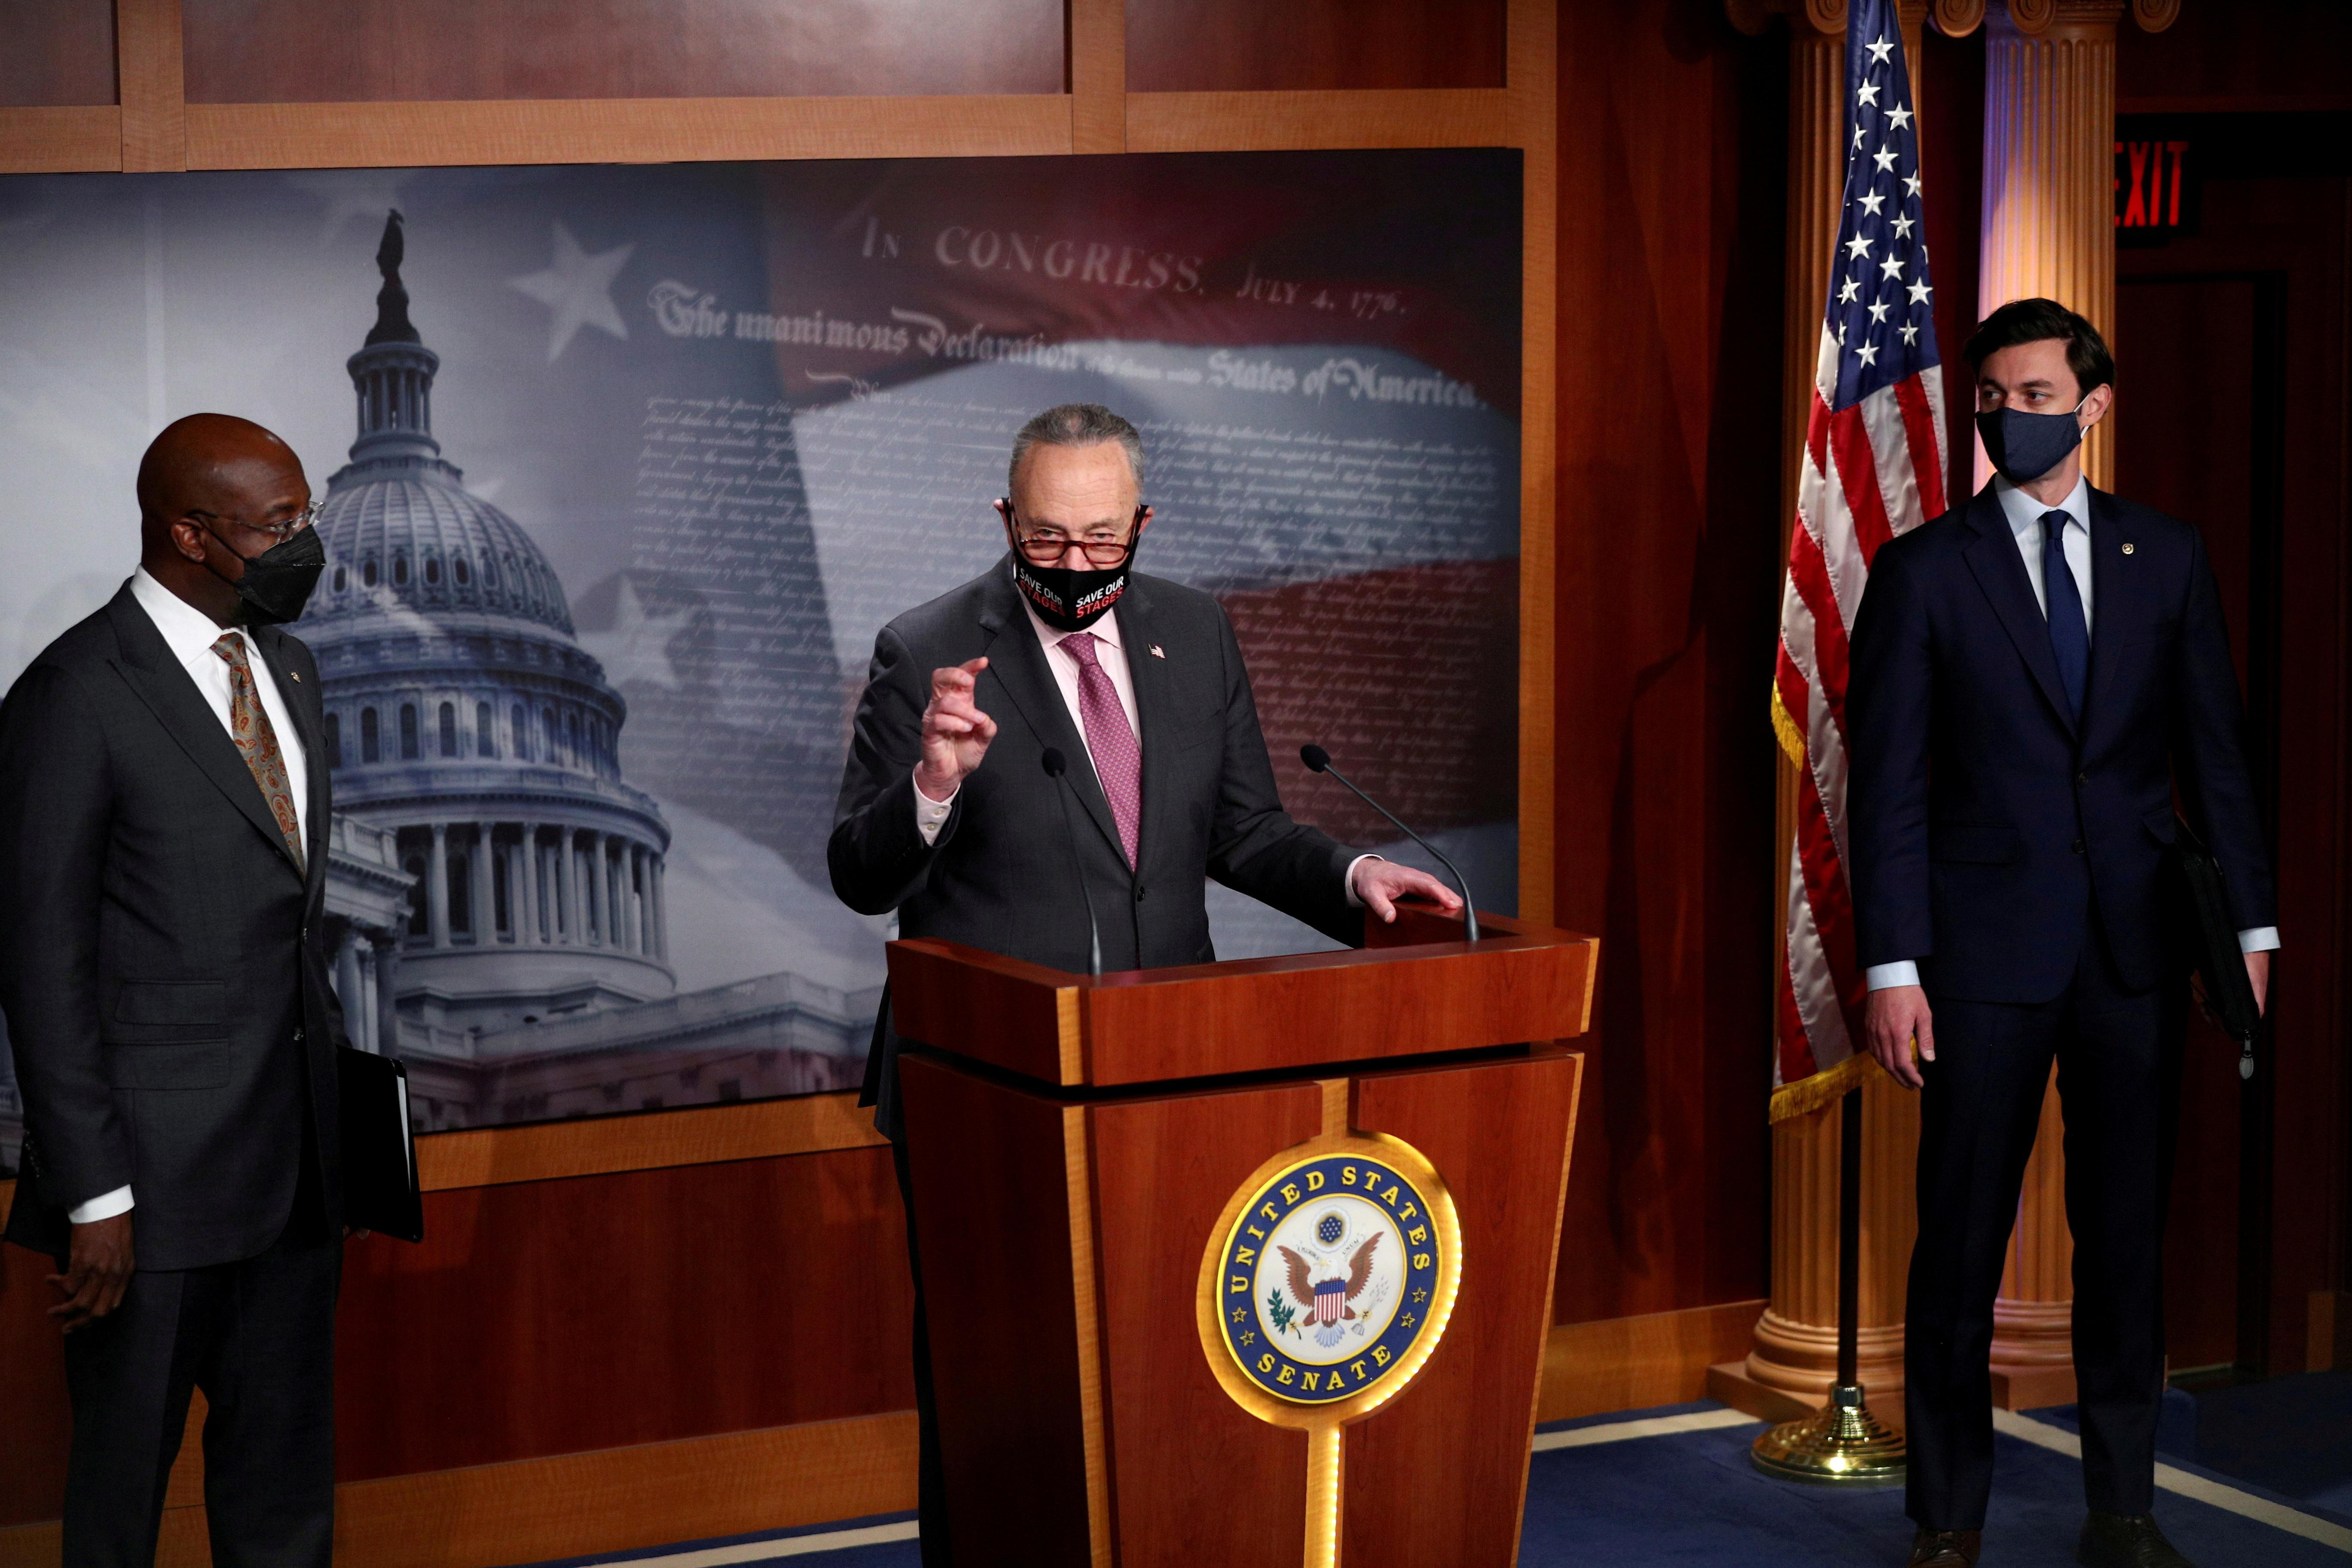 Senate Majority Leader Chuck Schumer (D-NY) delivers remarks beside Senators Jon Ossoff and Raphael Warnock (D-GA) on COVID-19 relief, amid the coronavirus disease (COVID-19) outbreak, on Capitol Hill in Washington, U.S., February 11, 2021. REUTERS/Tom Brenner/File Photo